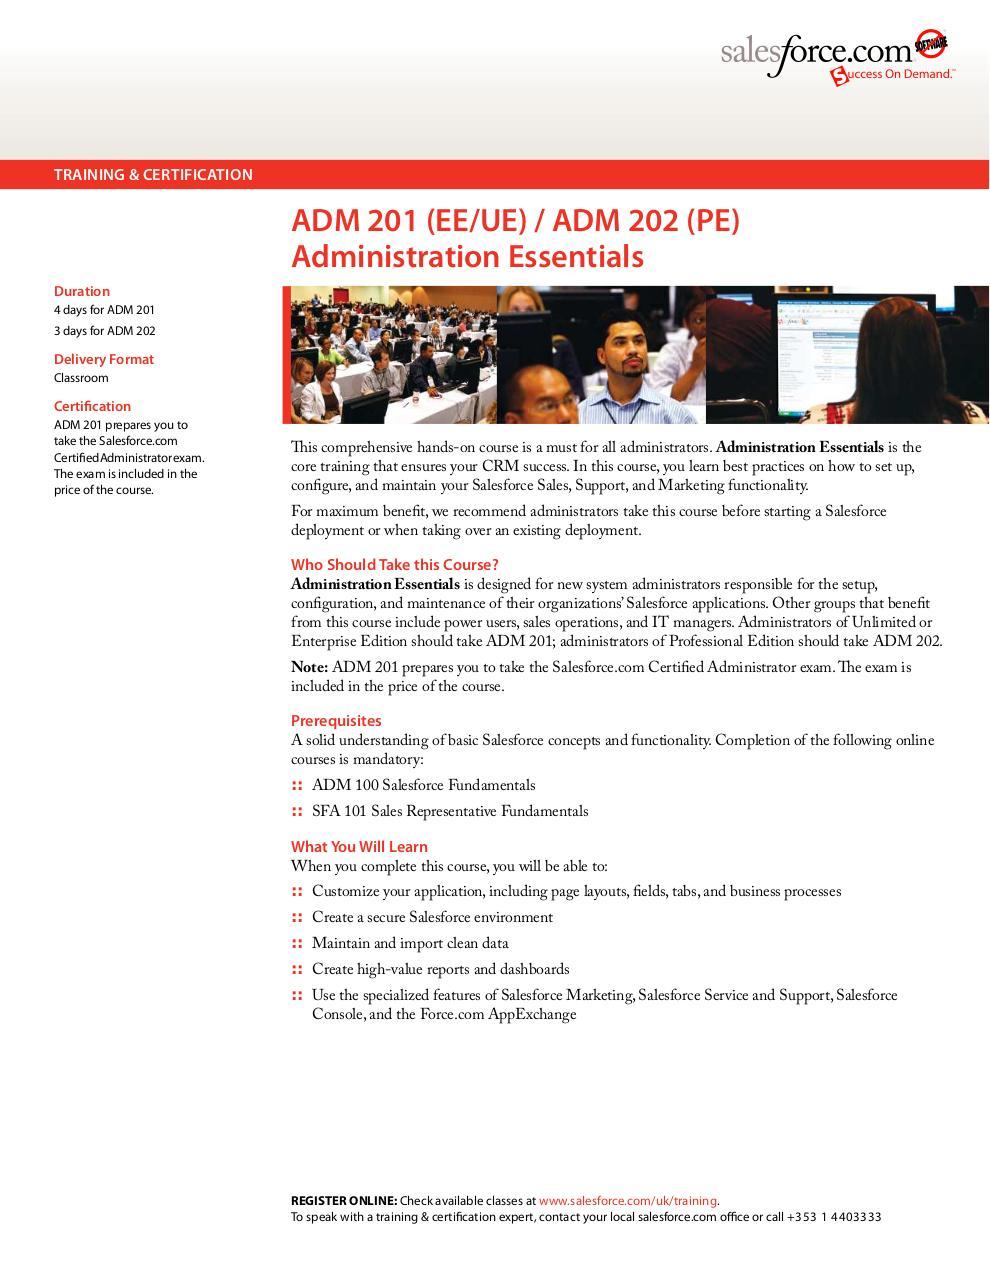 Ds Adm201 202 071108 Uk Ds Adm201 202 Pdf Fichier Pdf